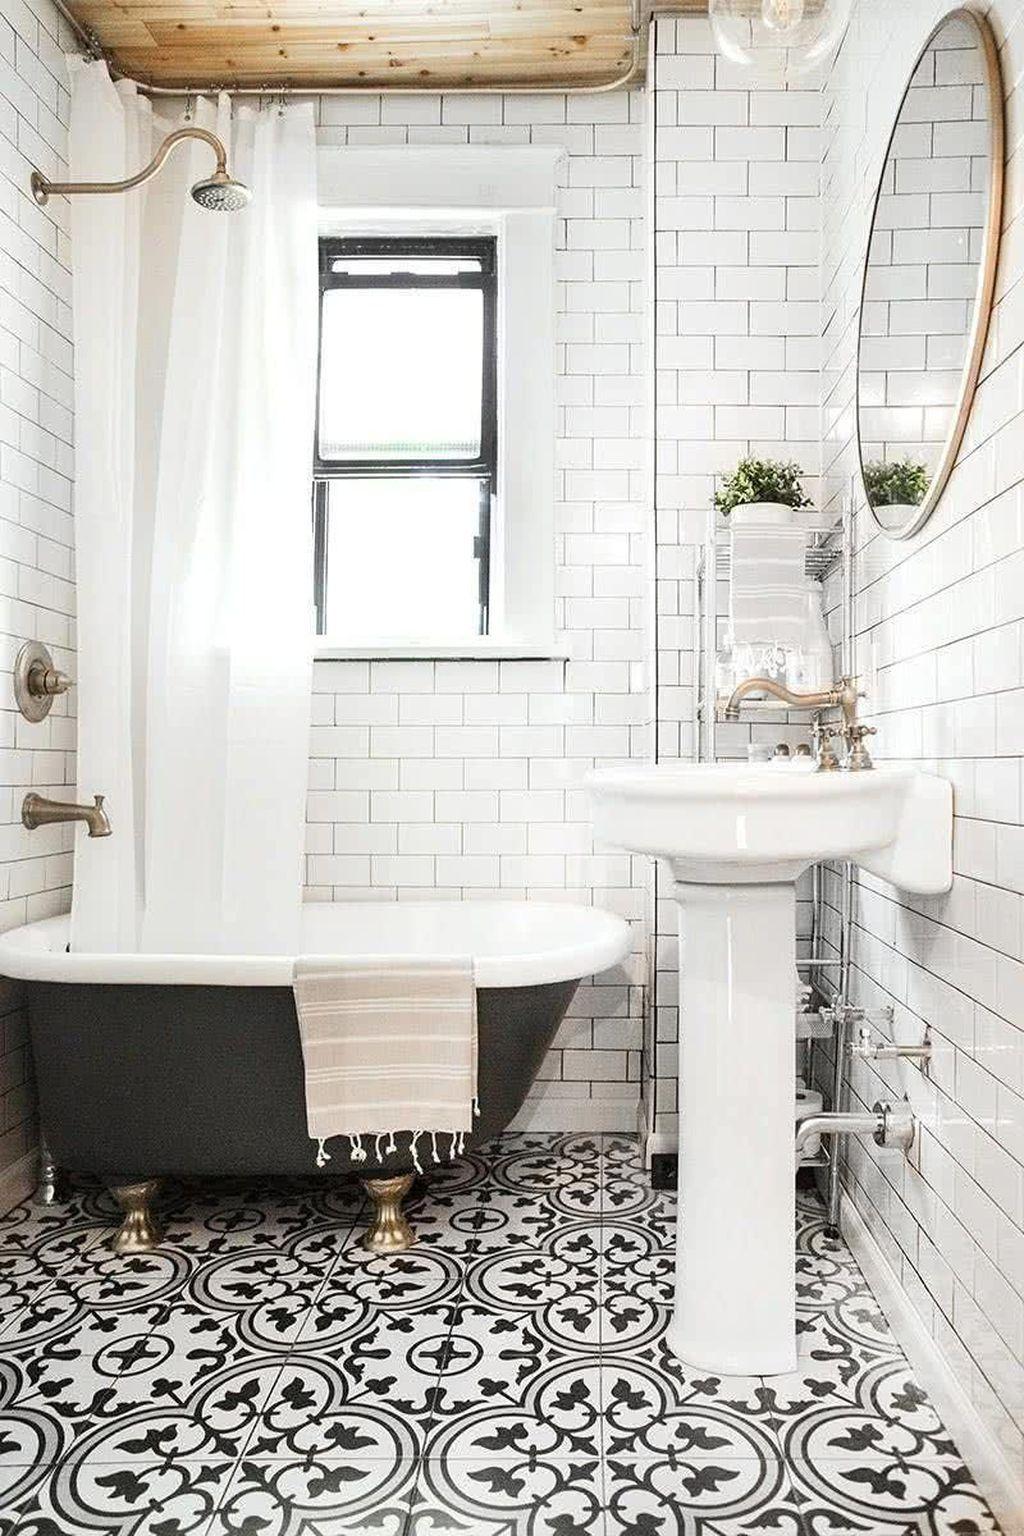 101 Fancy Bathroom Design Ideas With A Small Tubs Modern Small